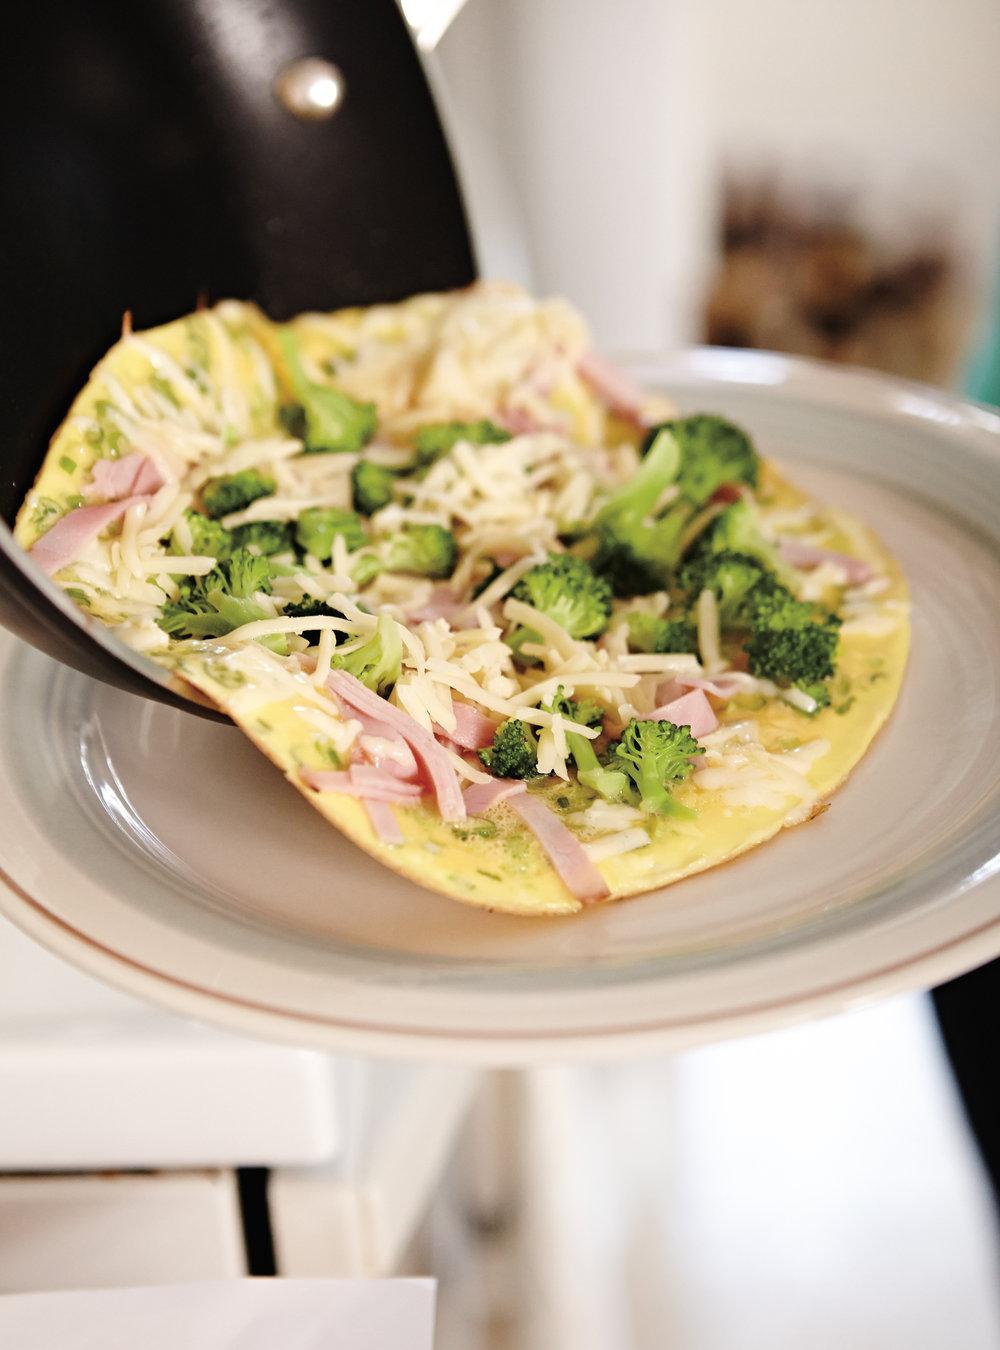 Omelette jambon-brocoli | ricardo